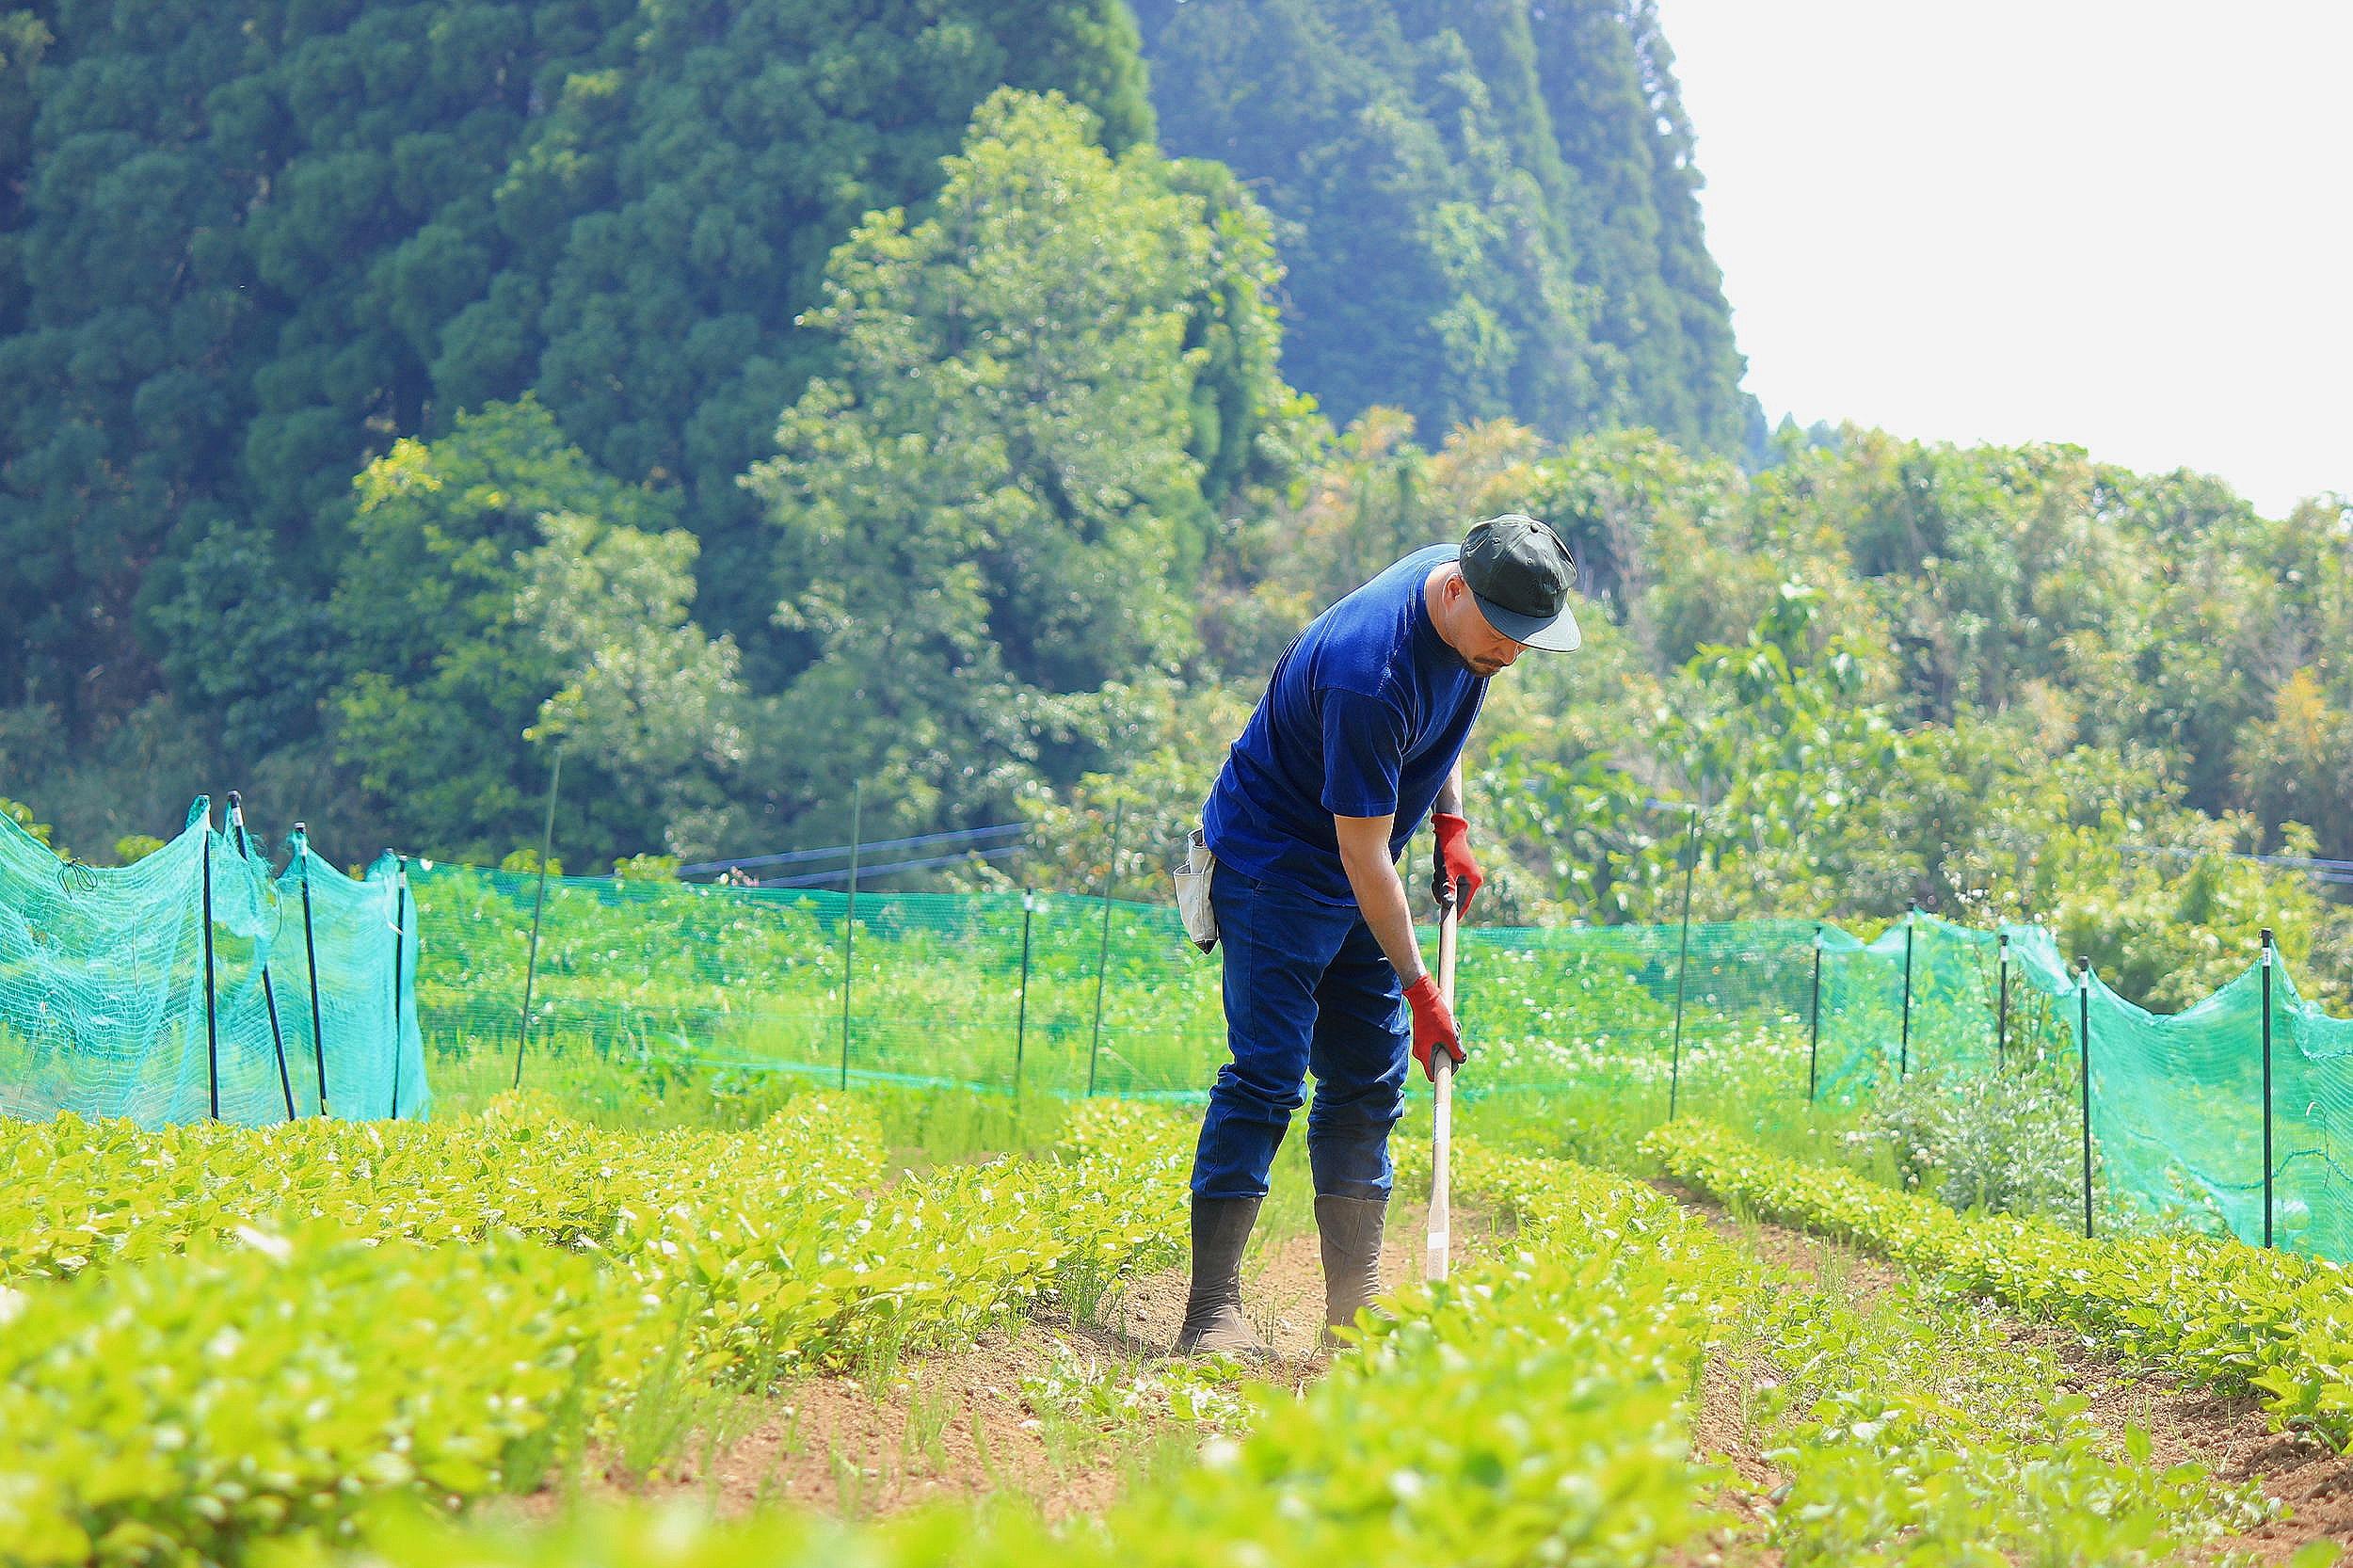 Black Bear Brand in Japan, Organic Indigo Farm